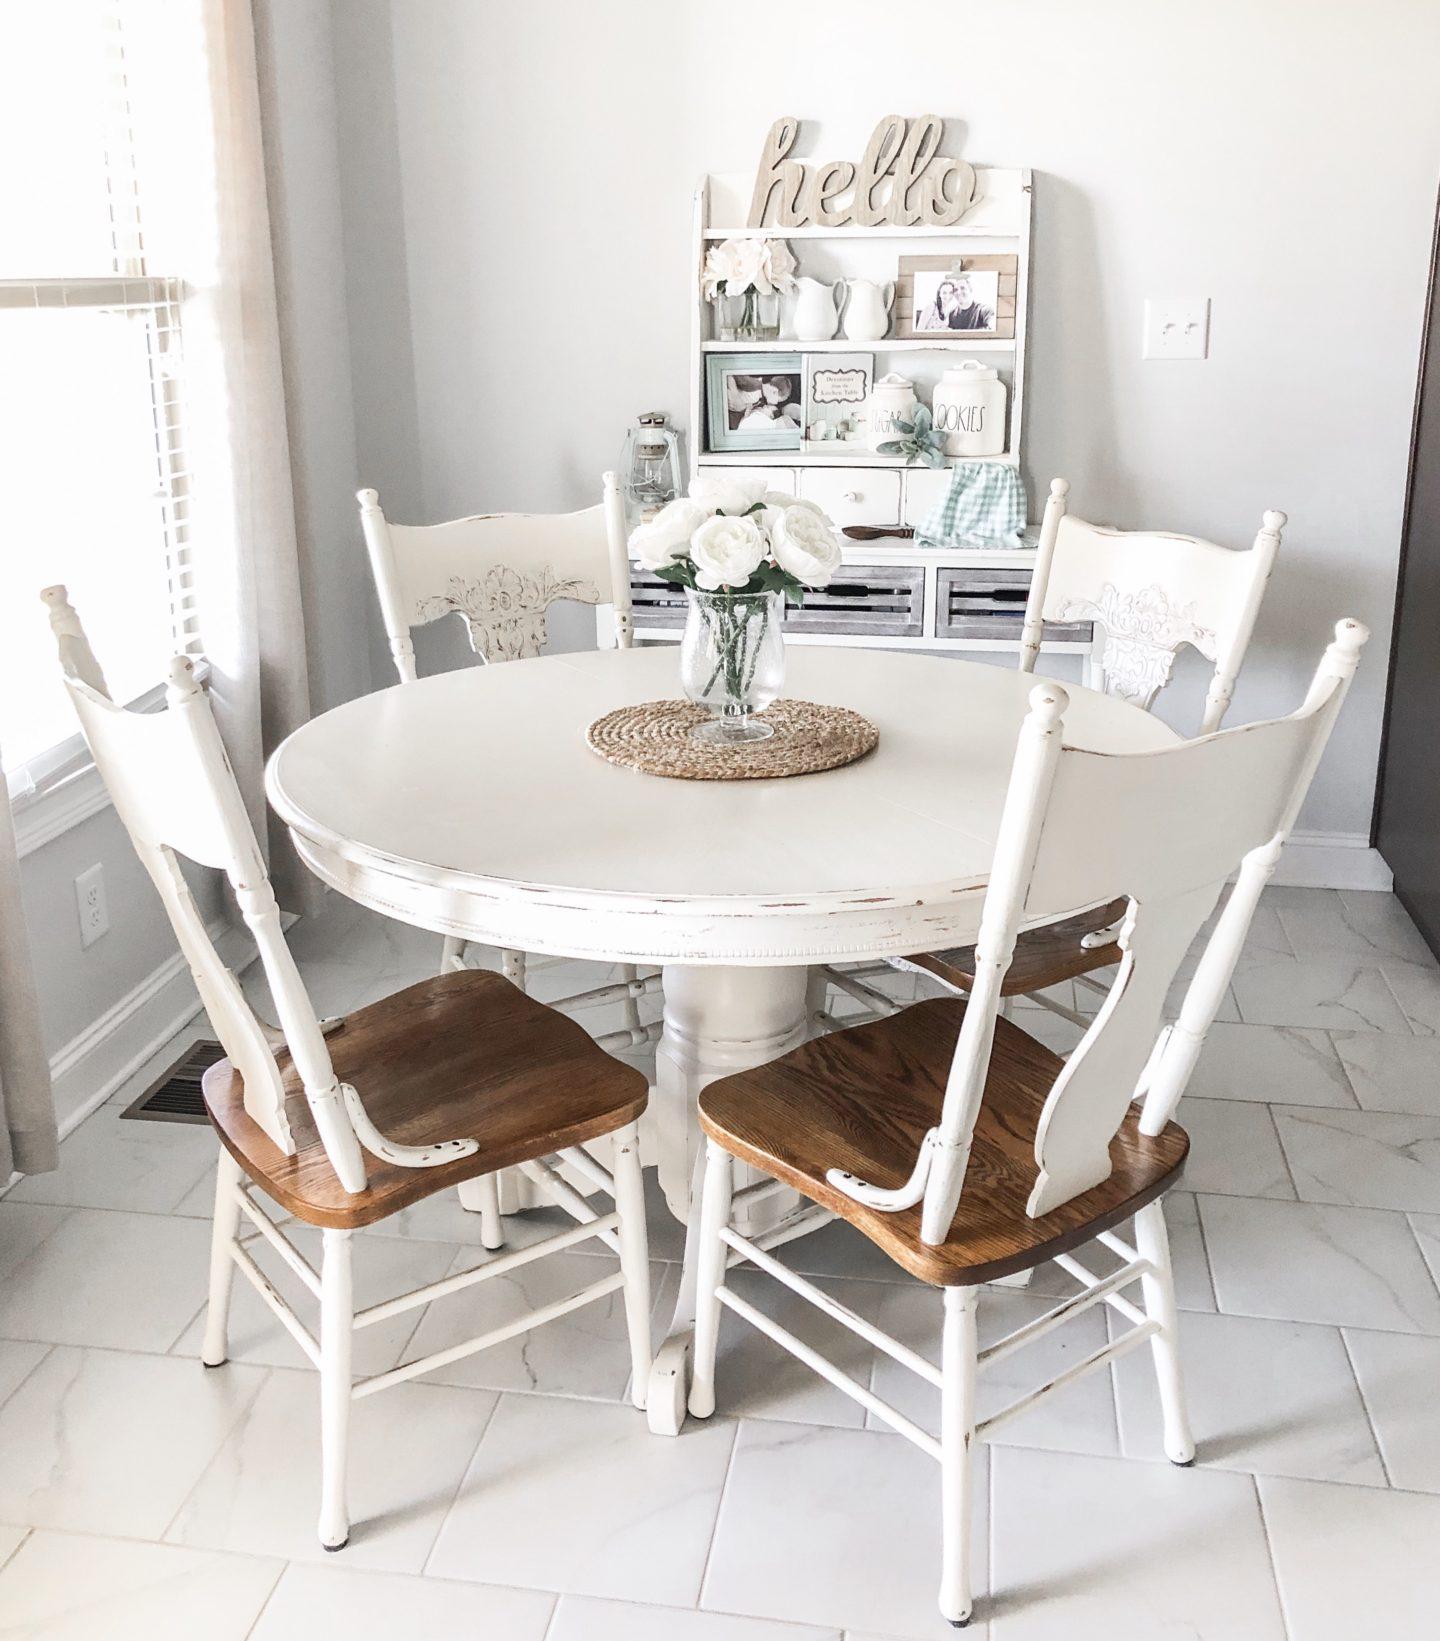 kateschwanke, kateschwanke blog, how to distress furniture, diy project, chalk paint, farmhouse table, farmhouse style